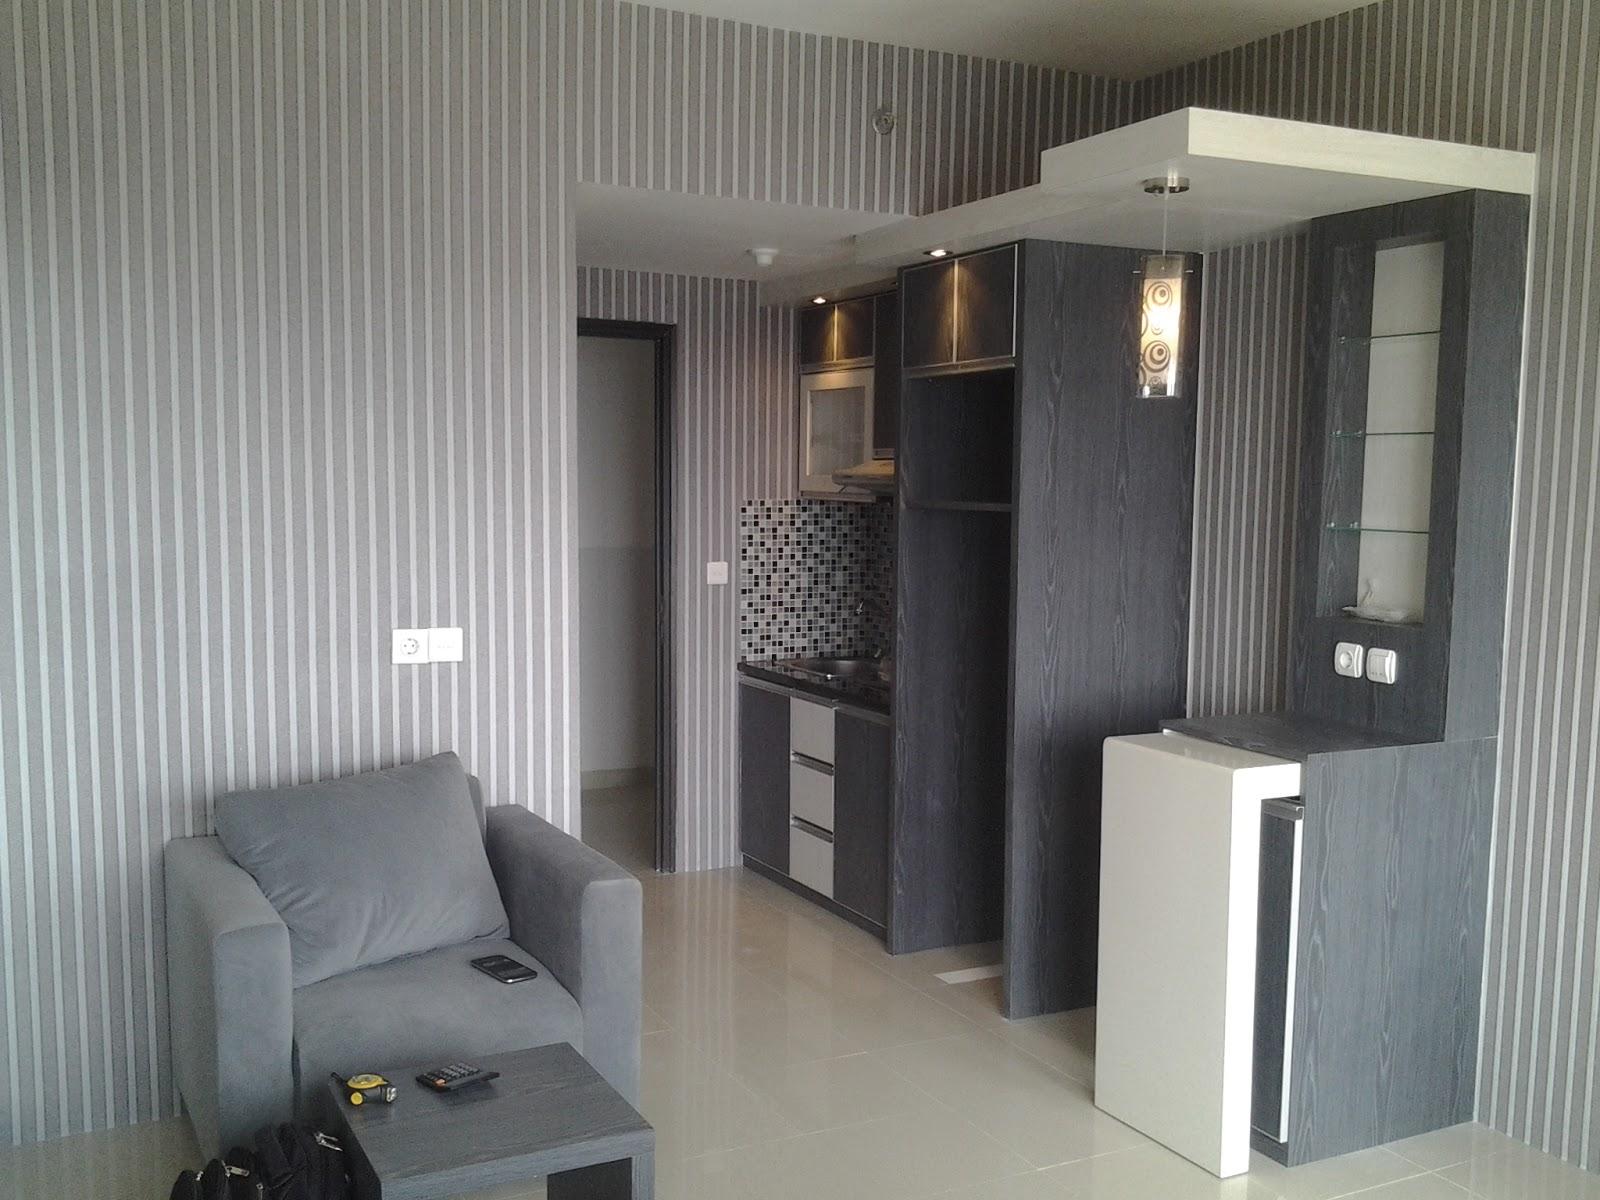 Desain Interior Apartemen Studio Jakarta Gambar Desain Rumah Minimalis